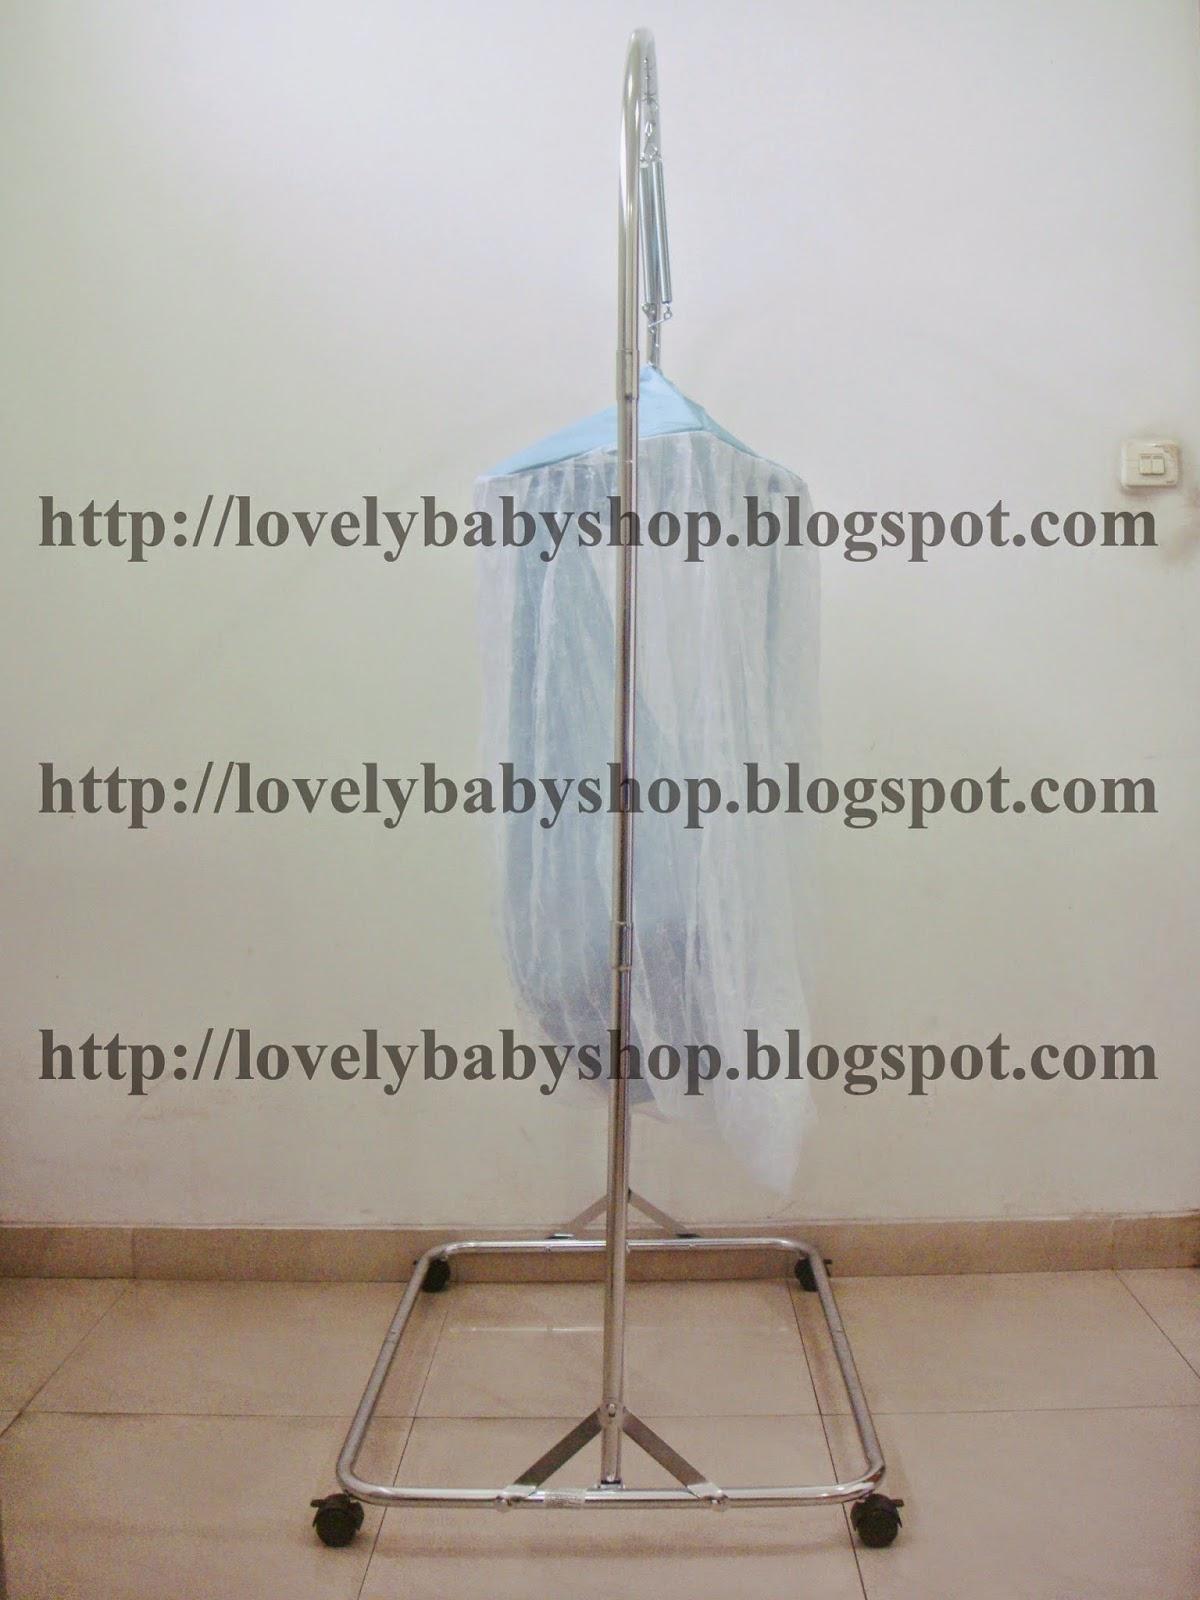 Lovely Baby Shop: KODE BARANG : BS09